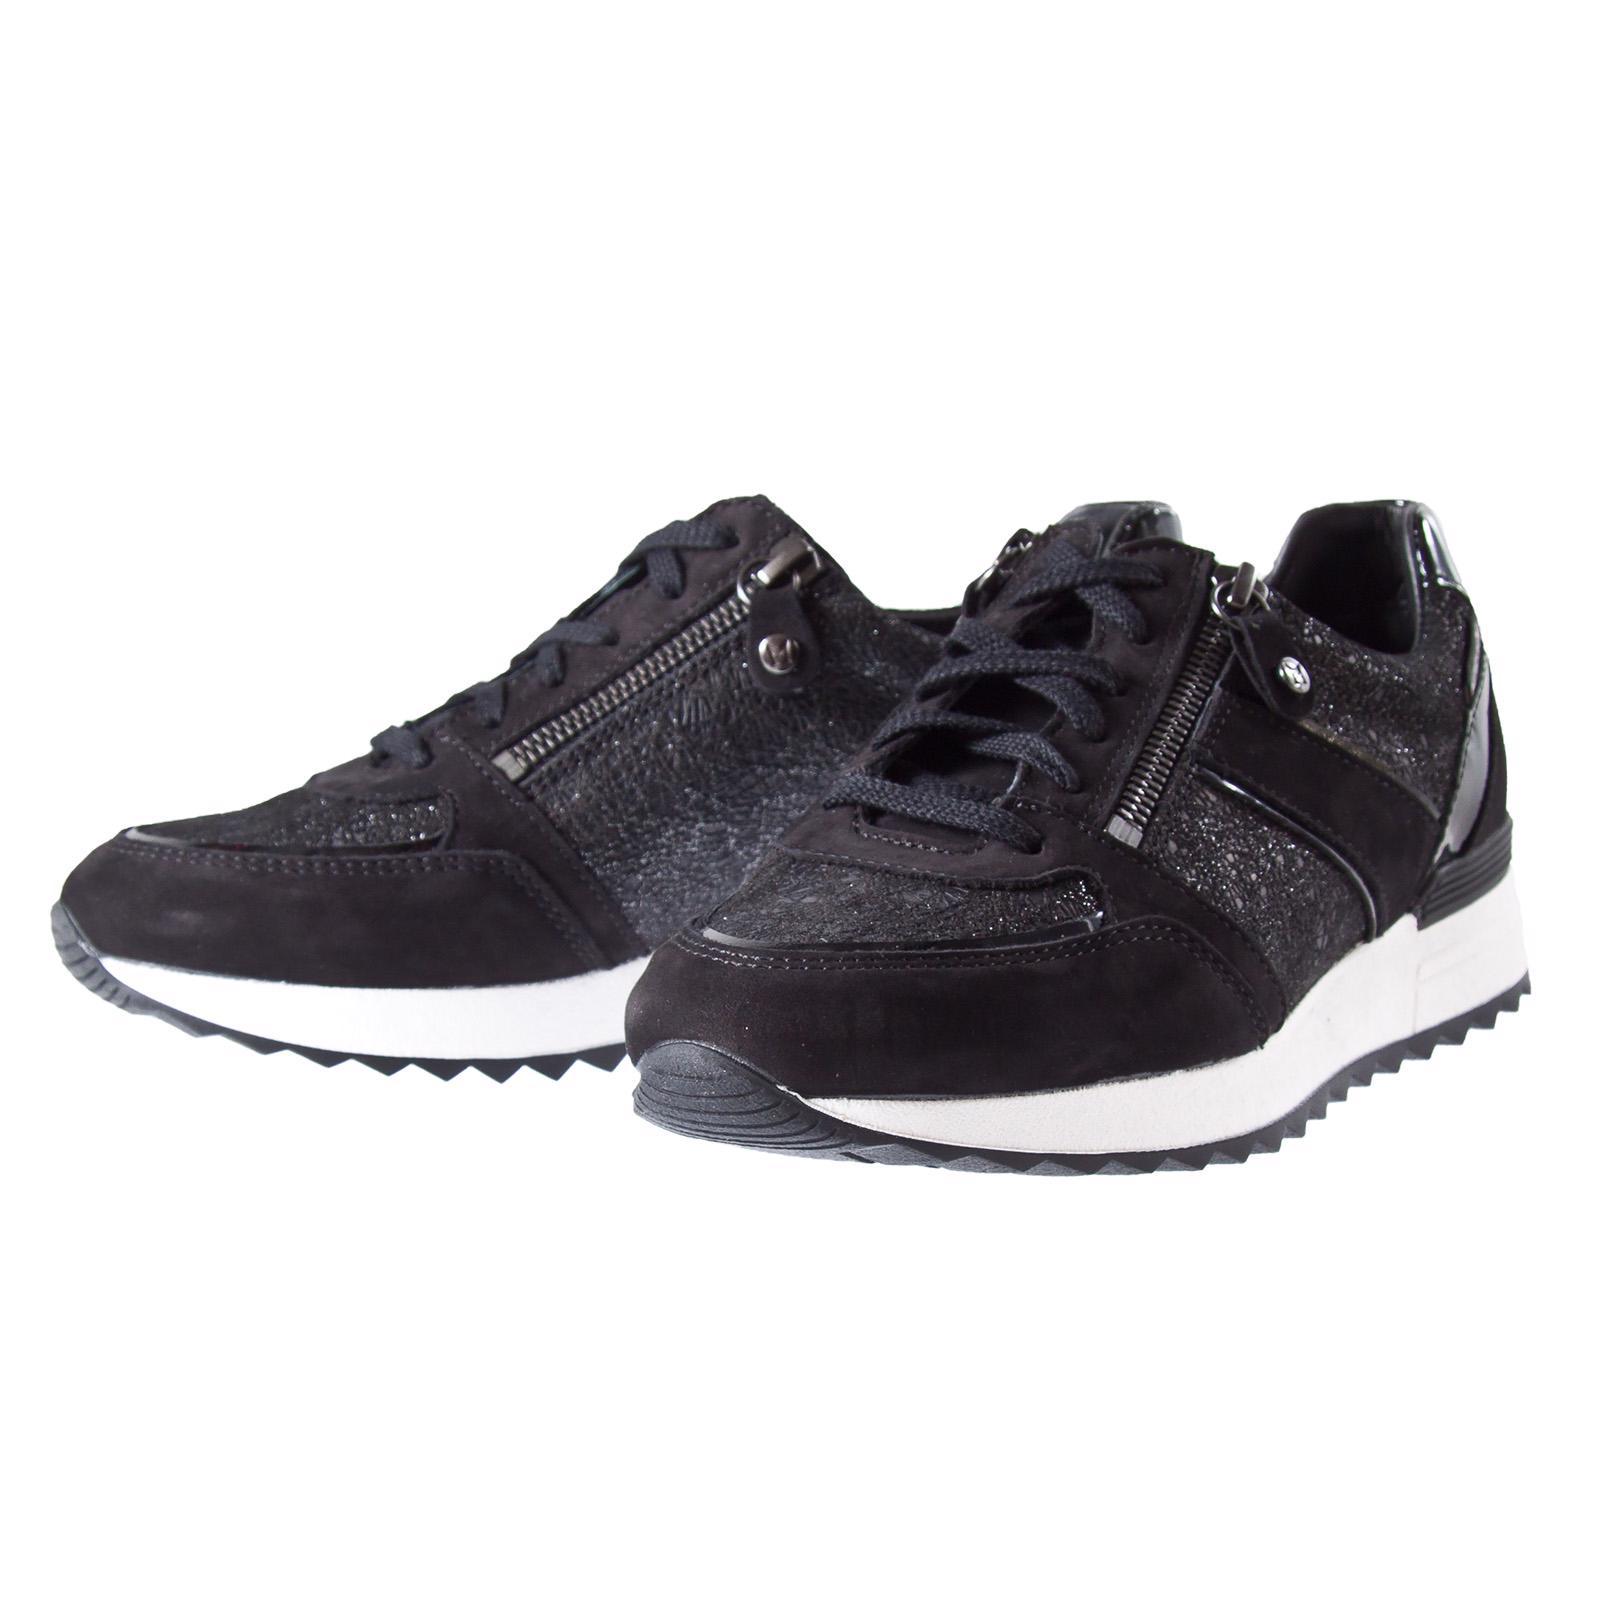 Chaussures Para Botte Noire TU0KhwUfbD